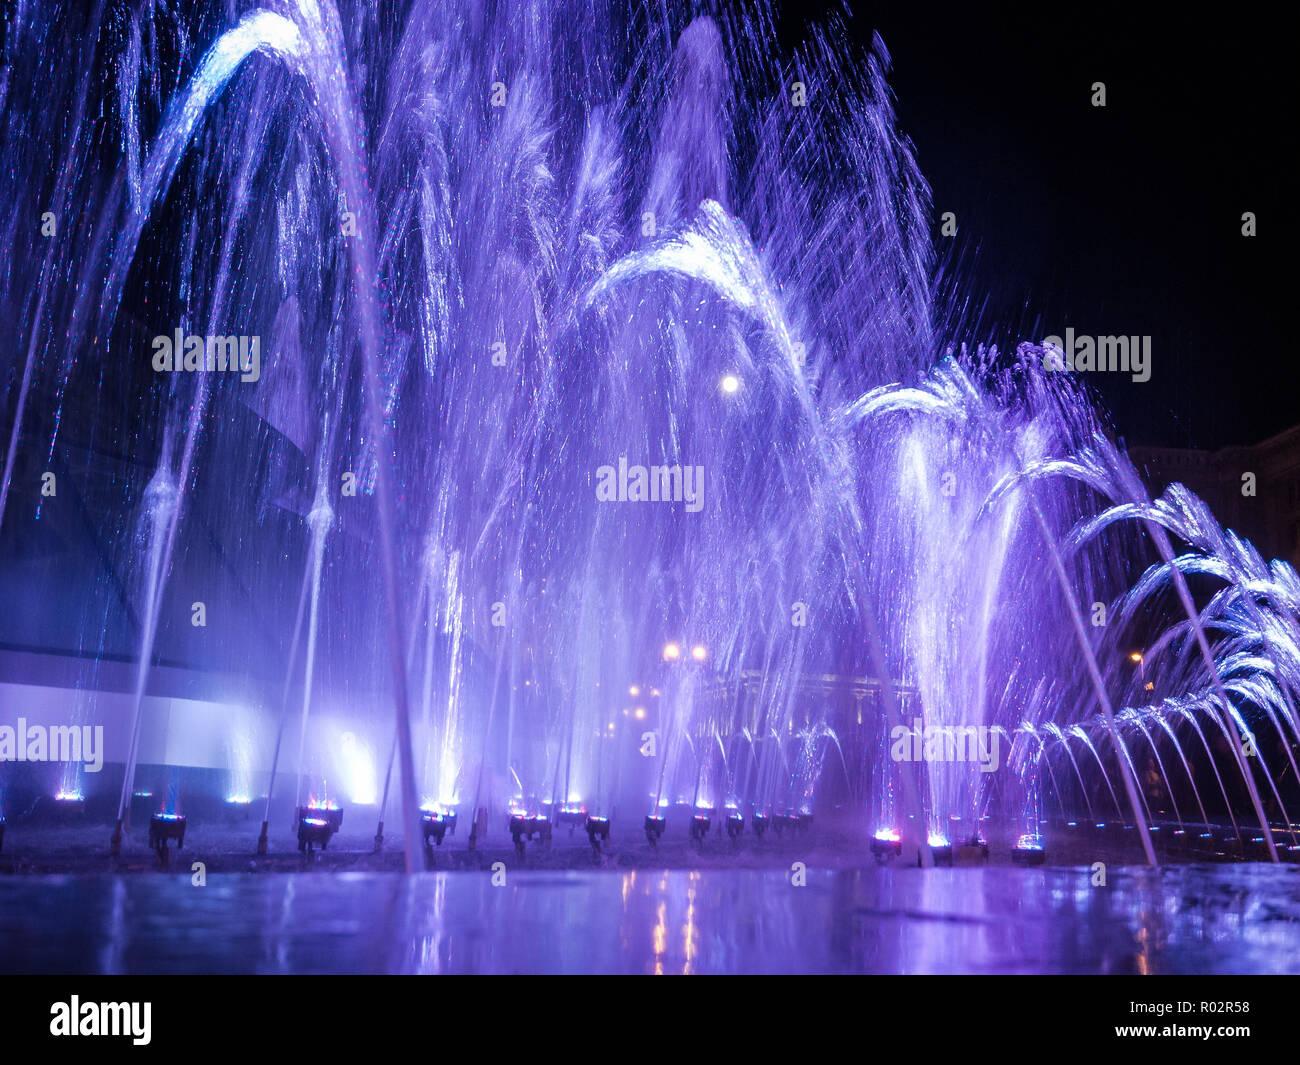 Getti D Acqua Fontane.Colorate Di Getti Di Acqua Nella Fontana Di Notte Foto